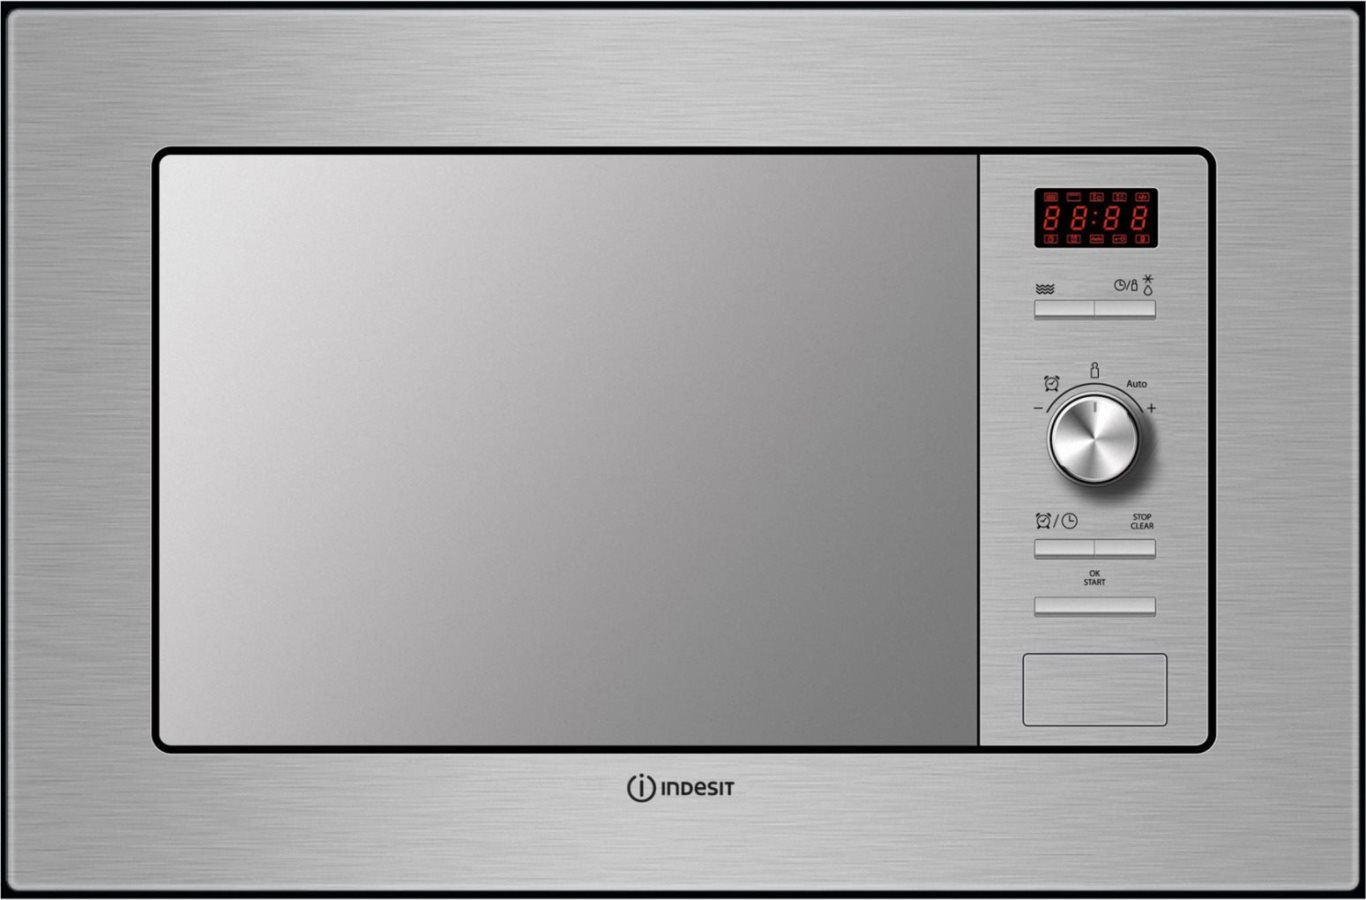 Indesit forno microonde incasso combinato grill 20 l 800w for Forno microonde combinato incasso